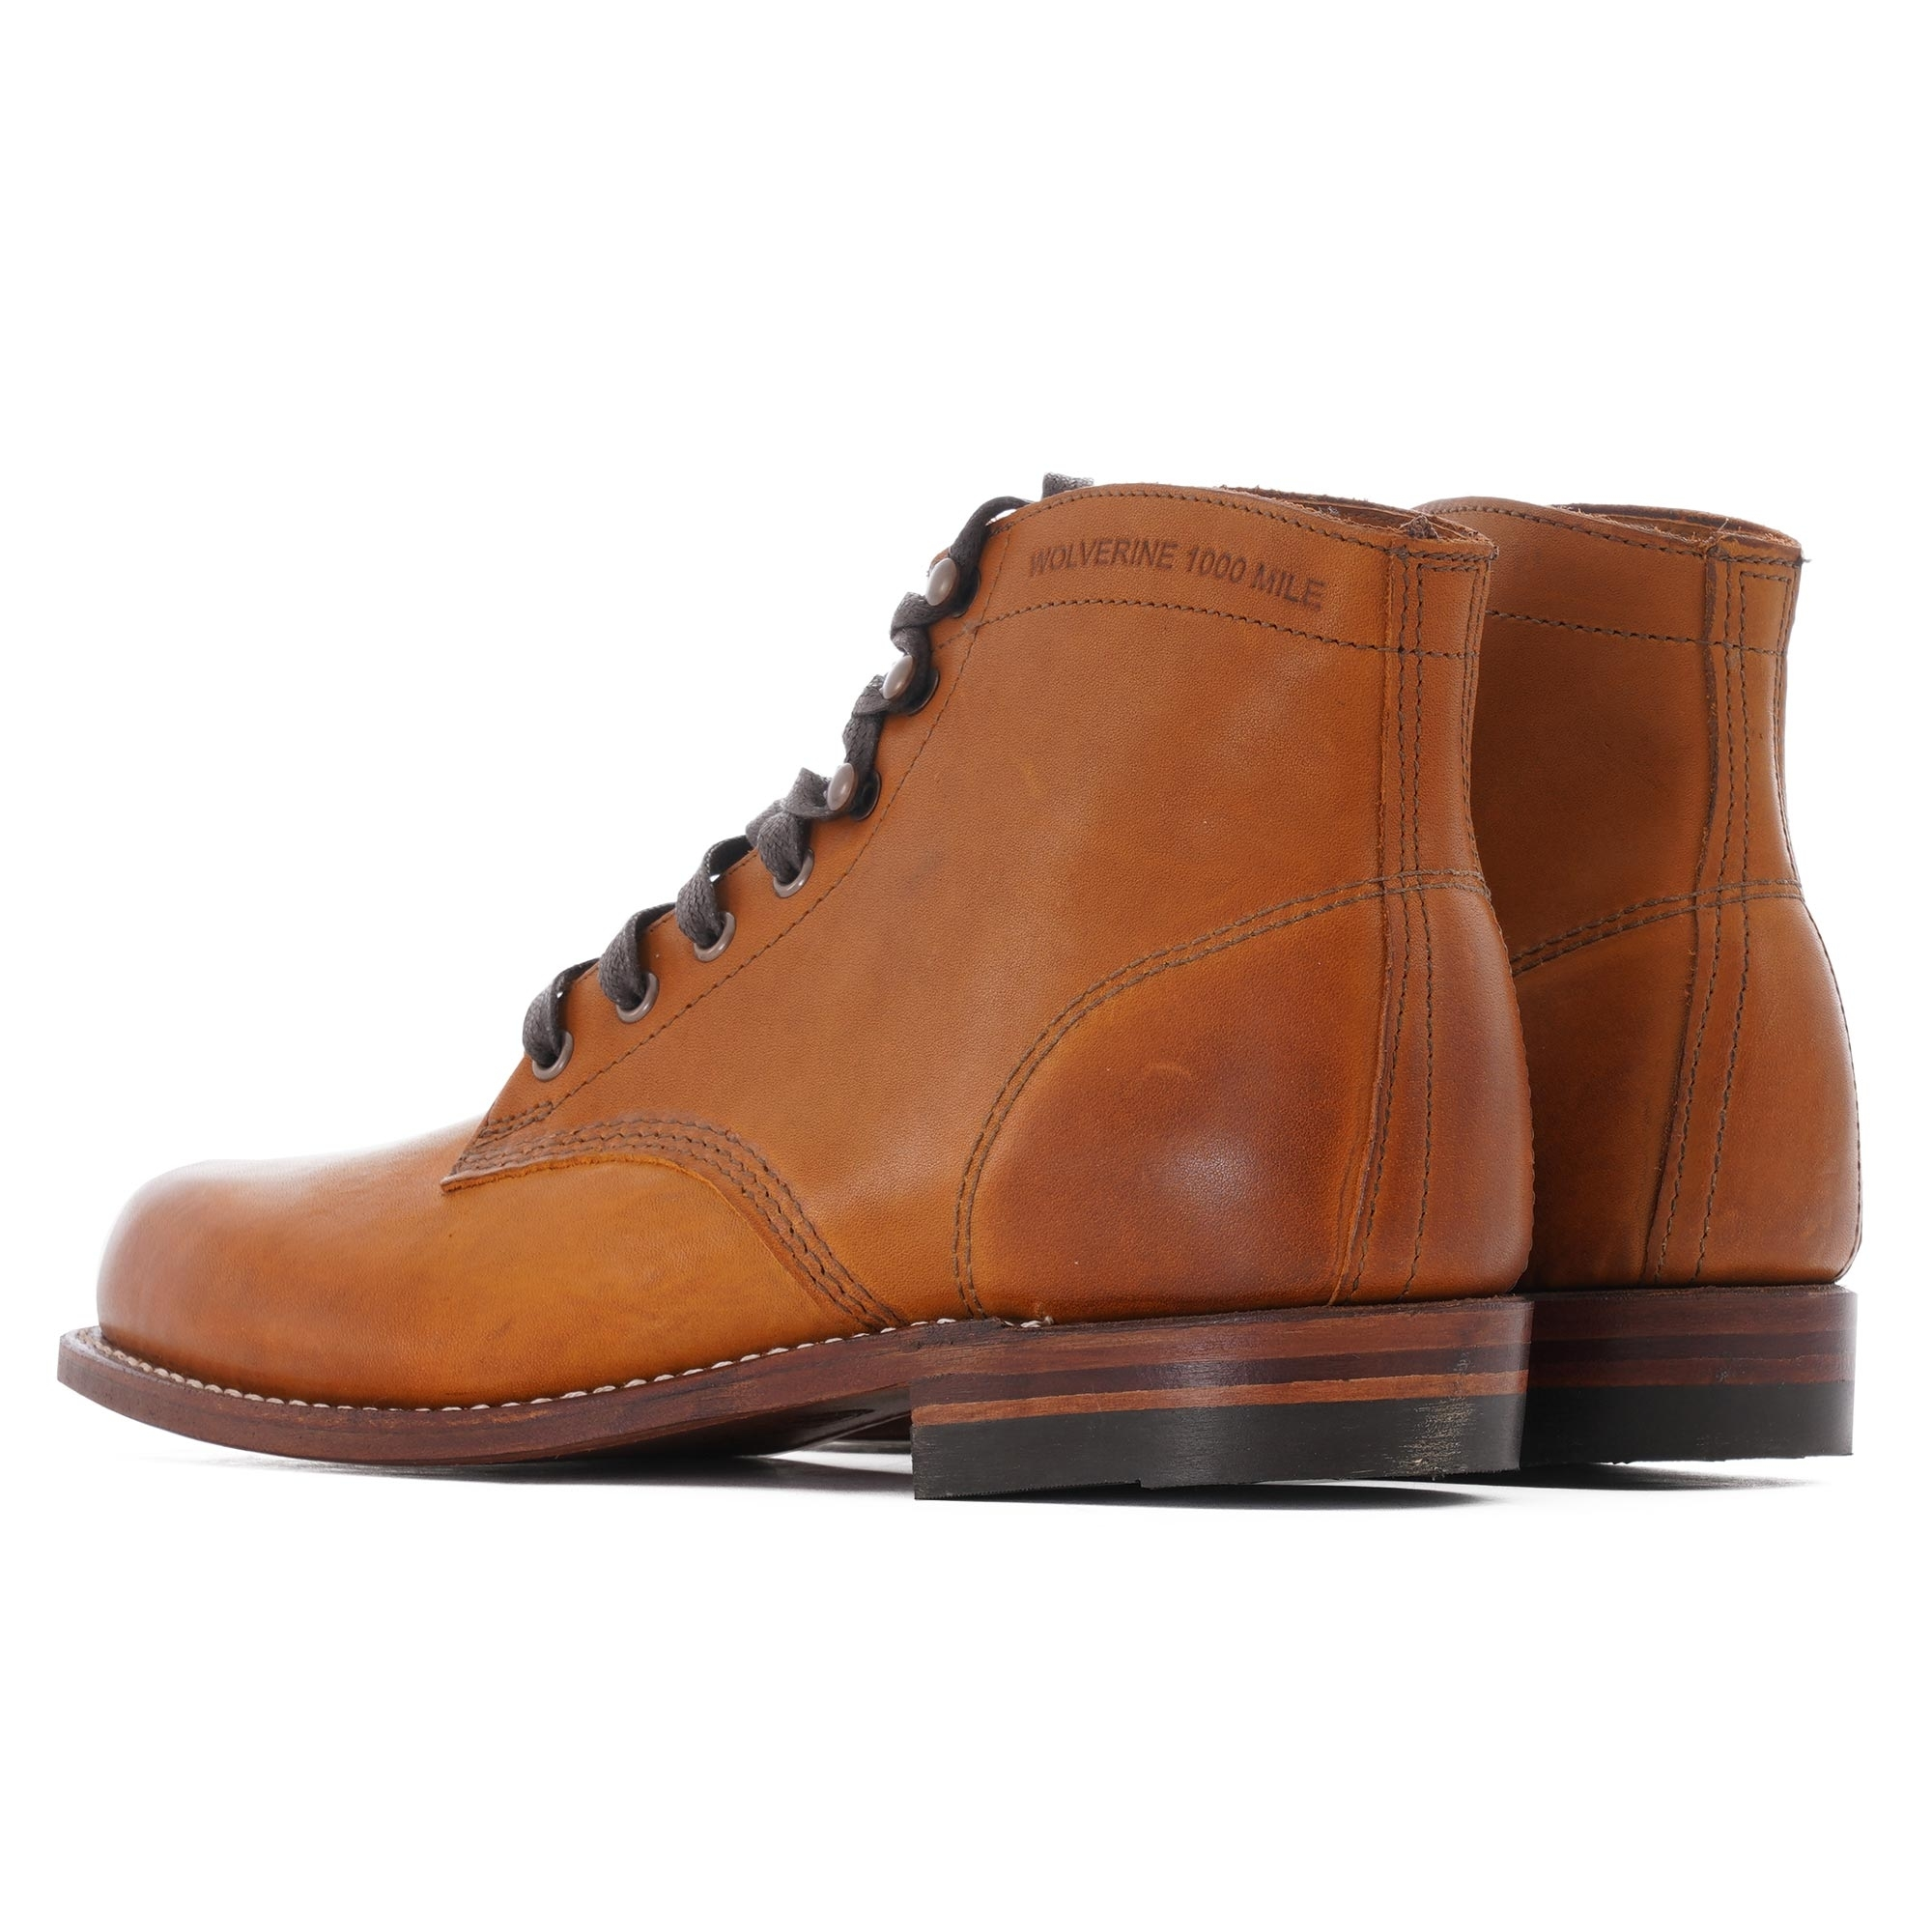 3cbe5c256e6 Wolverine Original 1000 Mile Boot - Tan